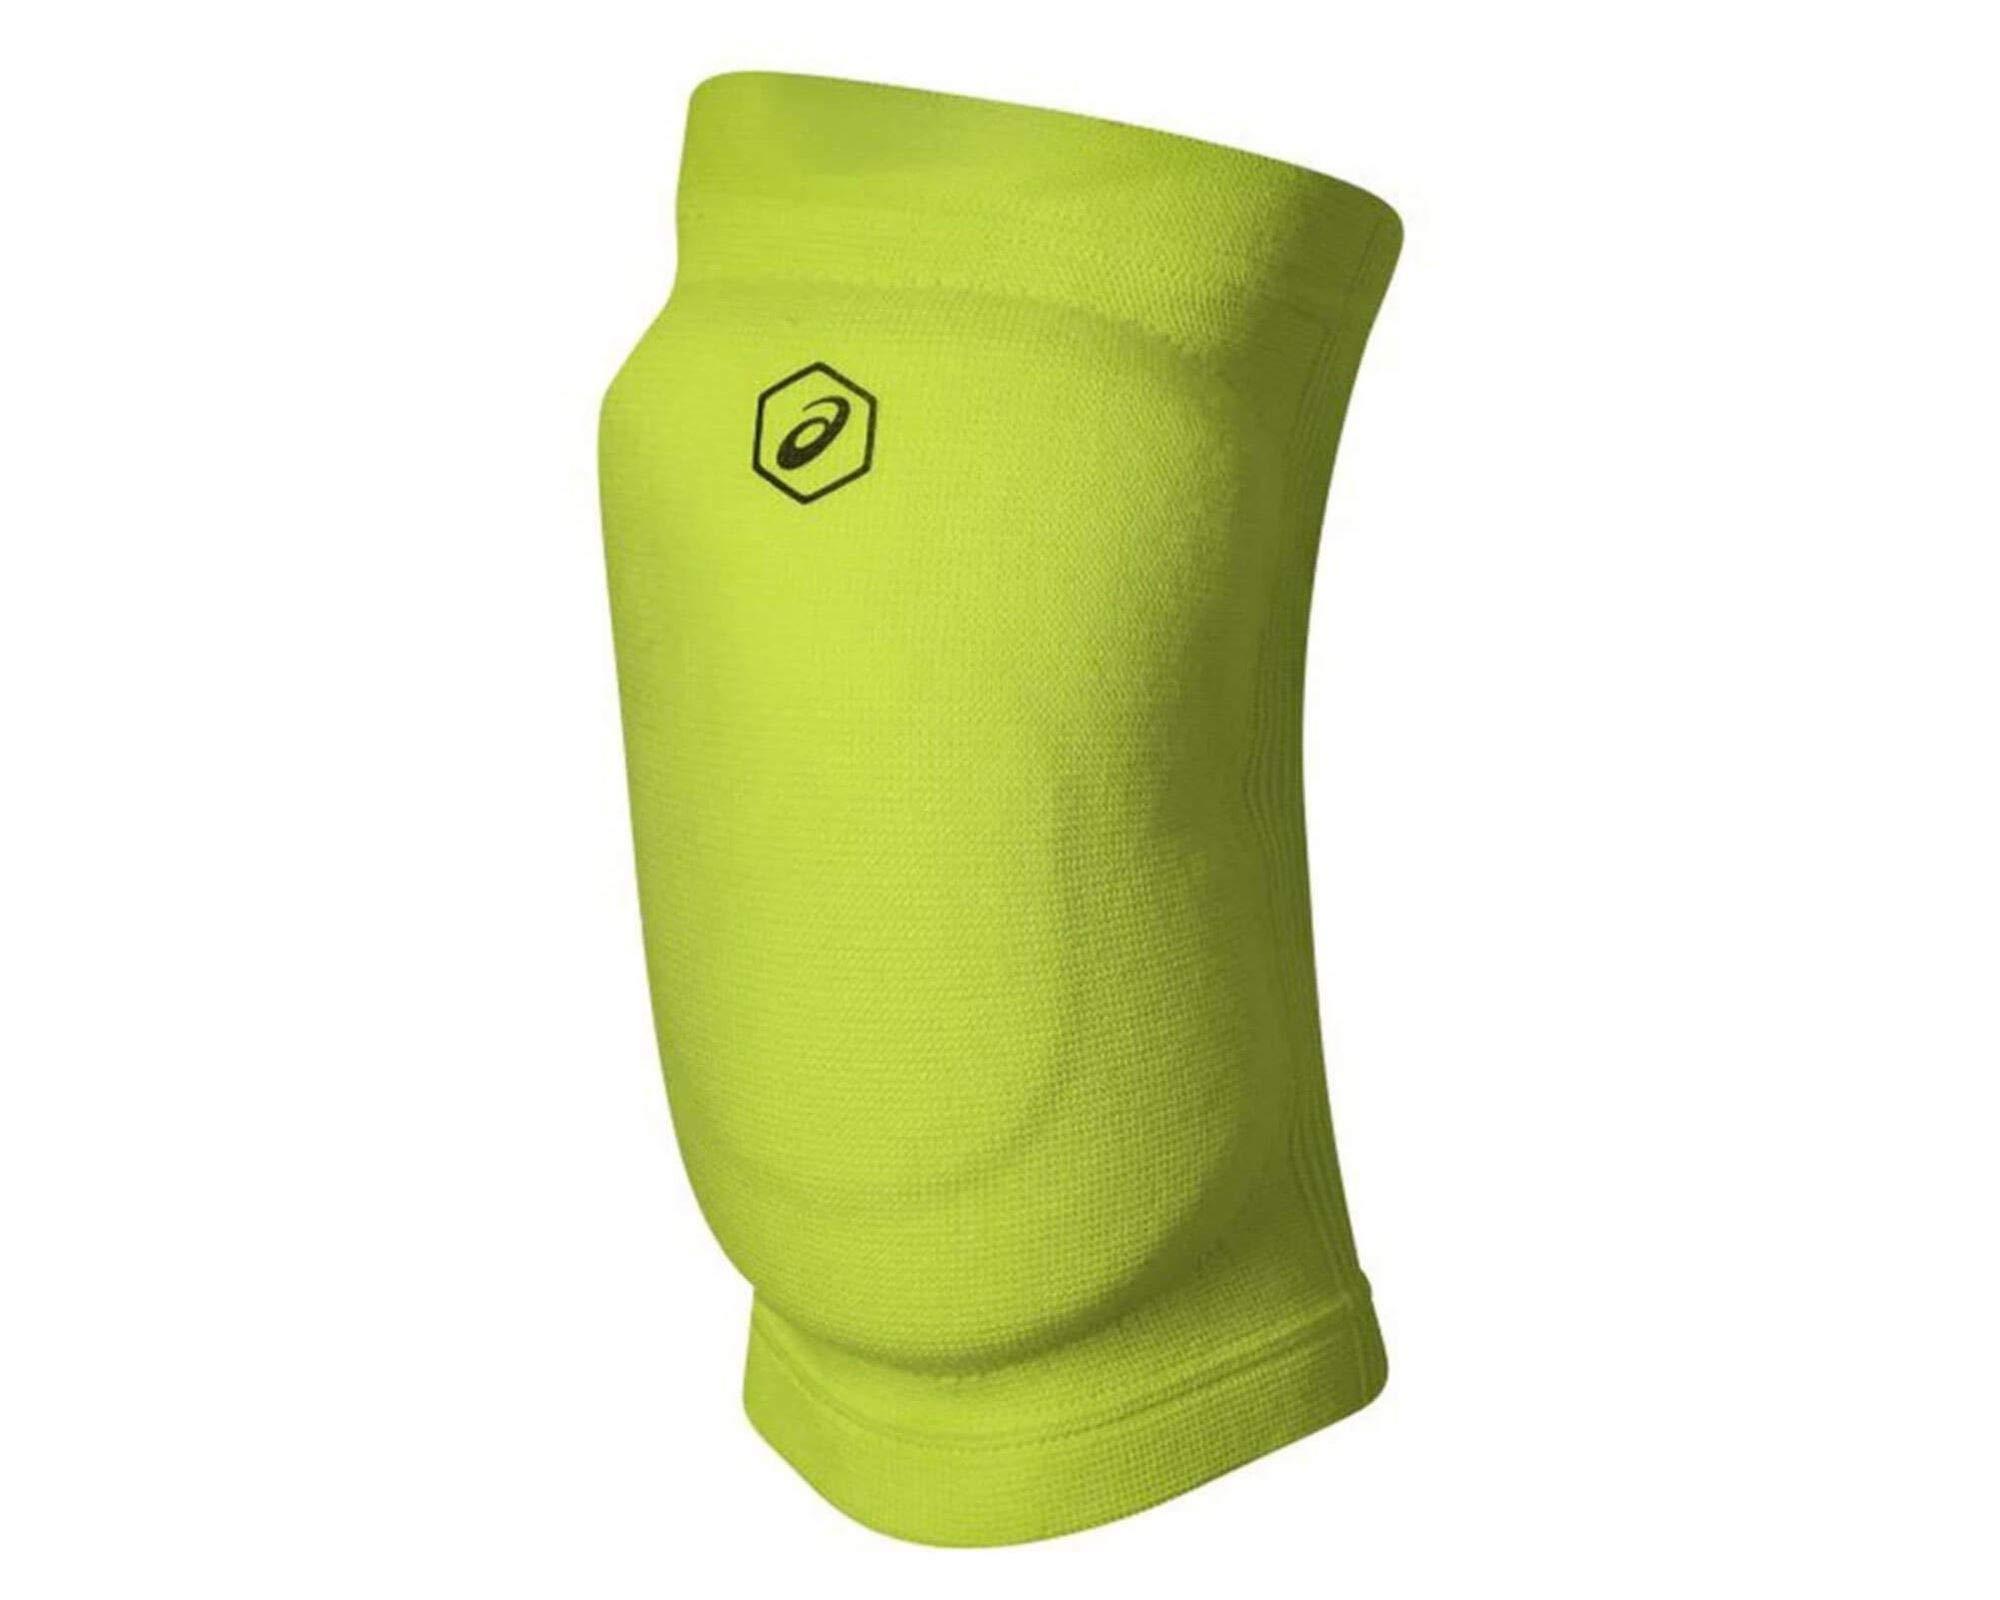 Asics Volleyball Knee Pad Gel Kneepad, Art. 1468150432- Buy Online ...